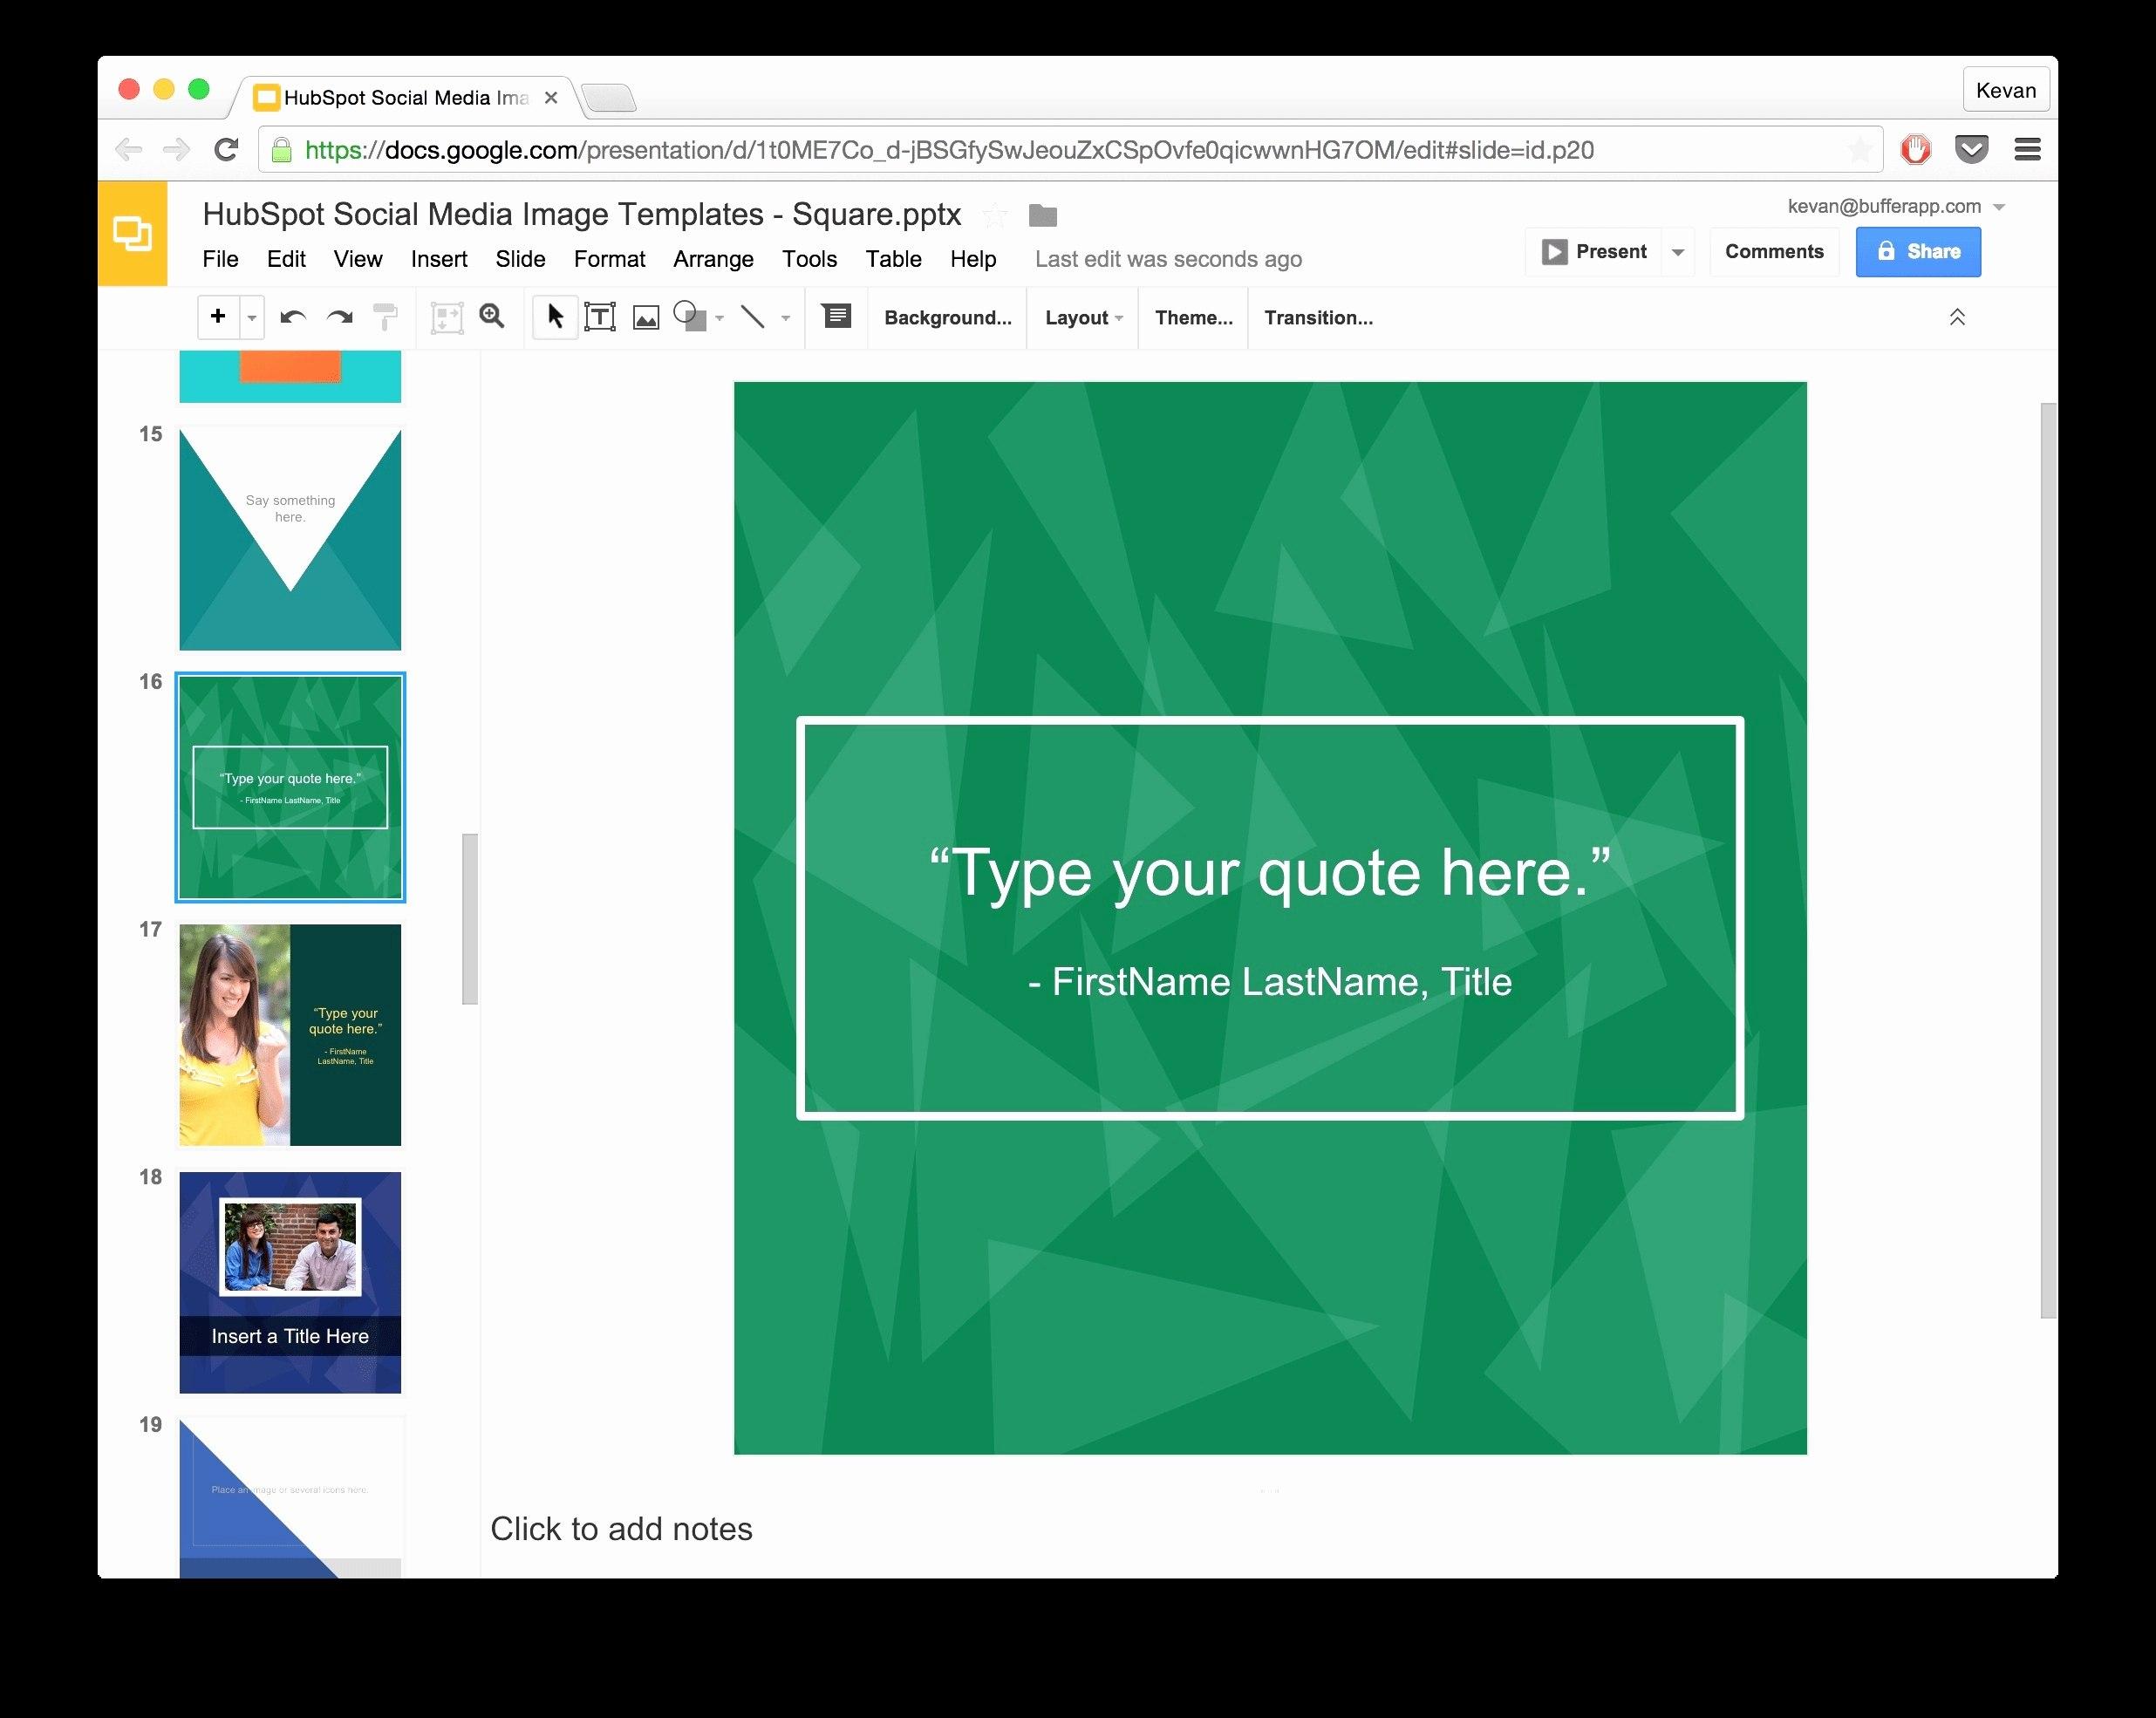 Inspirational Business Cards Google Docs  Hydraexecutives Regarding Business Card Template For Google Docs